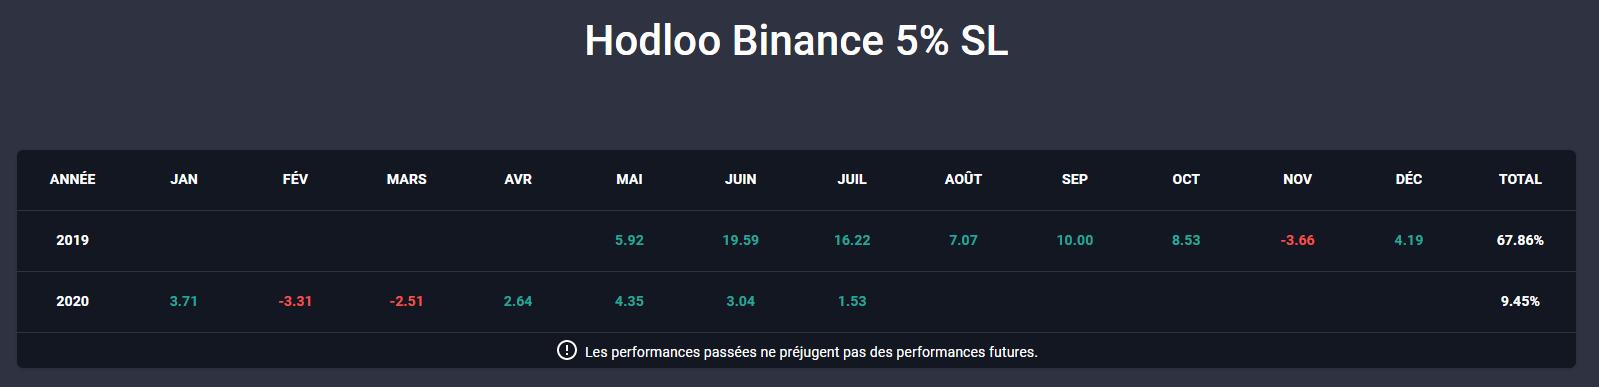 Résultats 2019-2020 du Trader Hodloo disponible sur le Copy Trading